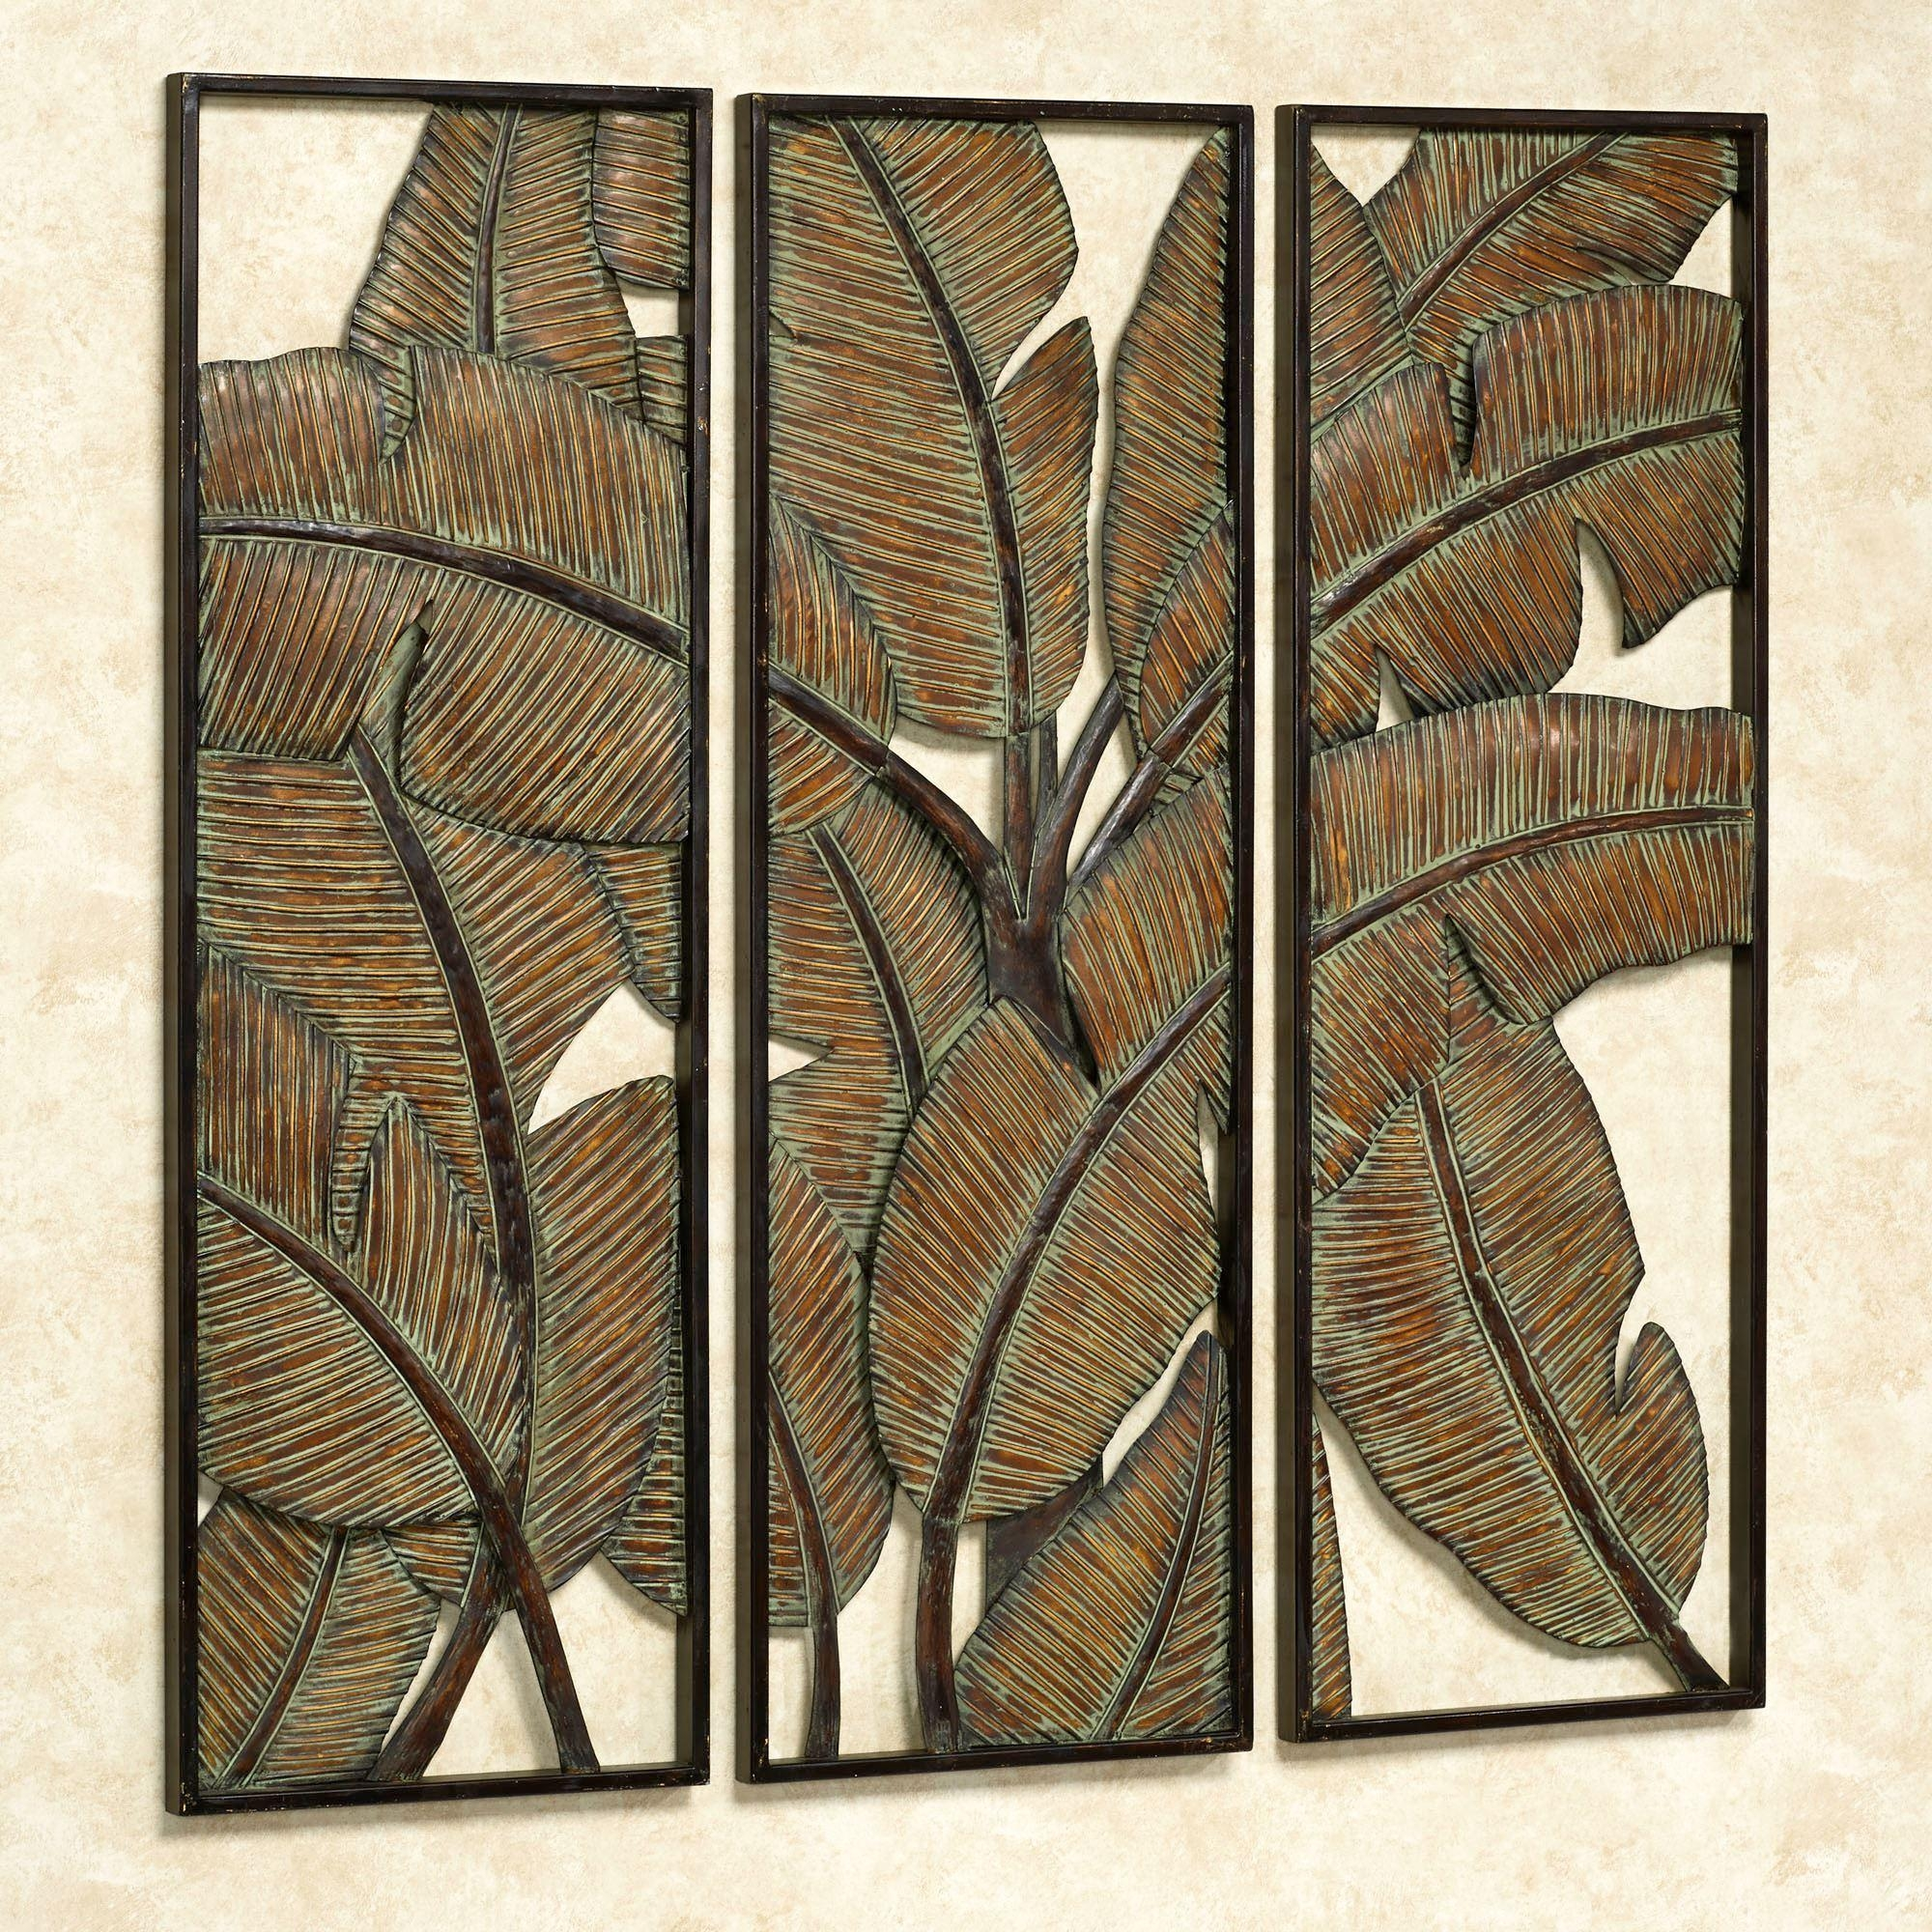 Kaylani Tropical Leaf Metal Wall Art Panel Set Regarding Three Panel Wall Art (View 17 of 20)